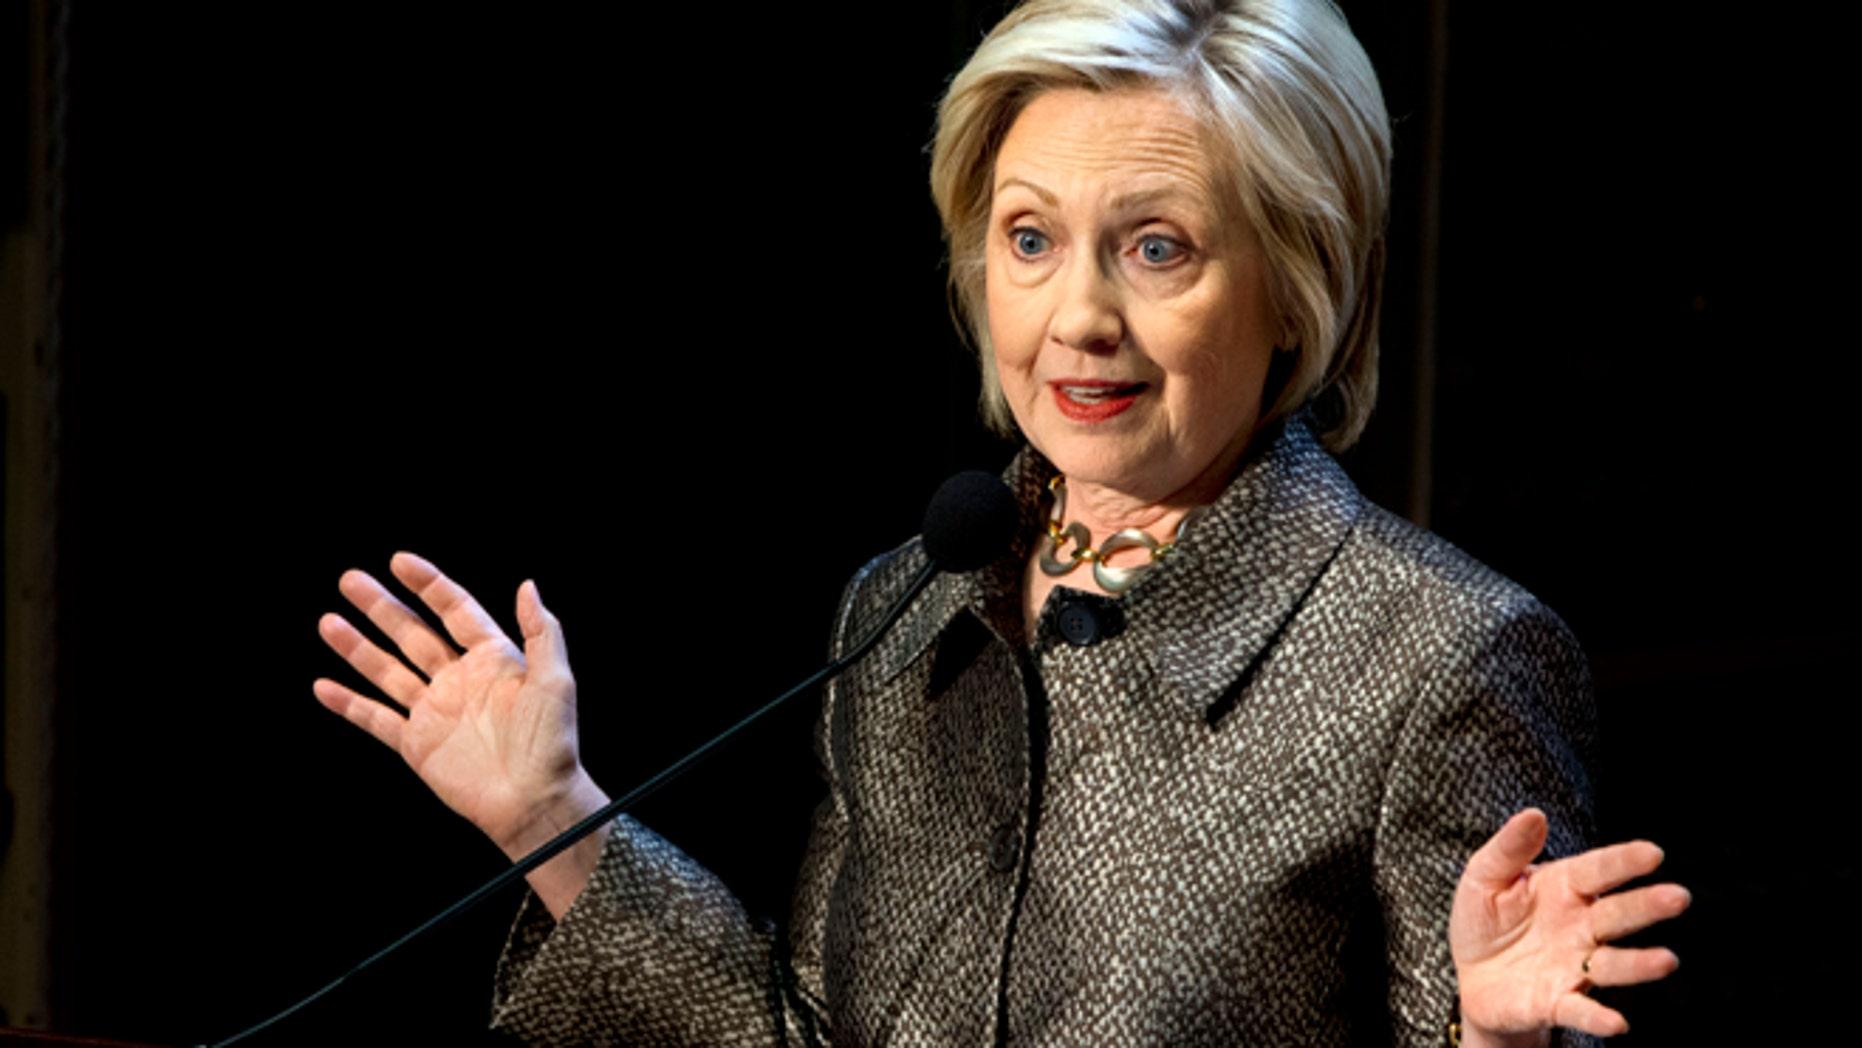 Democratic presidential candidate Hillary Rodham Clinton in Washington, on April 22, 2015.